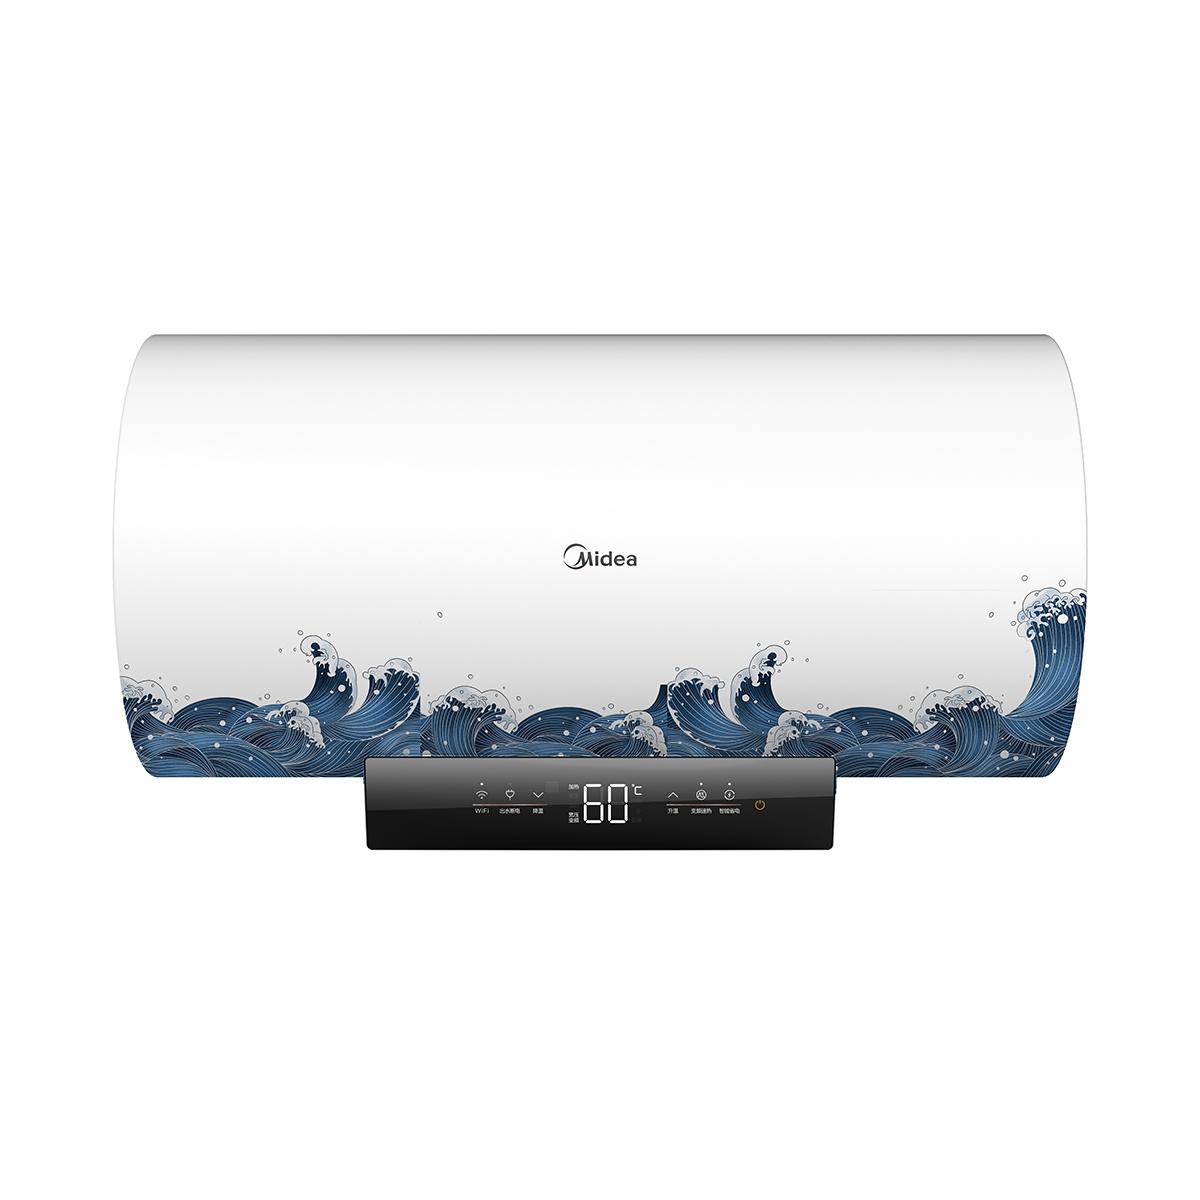 Midea/美的 F50-32DE7-A(HEY)电热水器 说明书.pdf